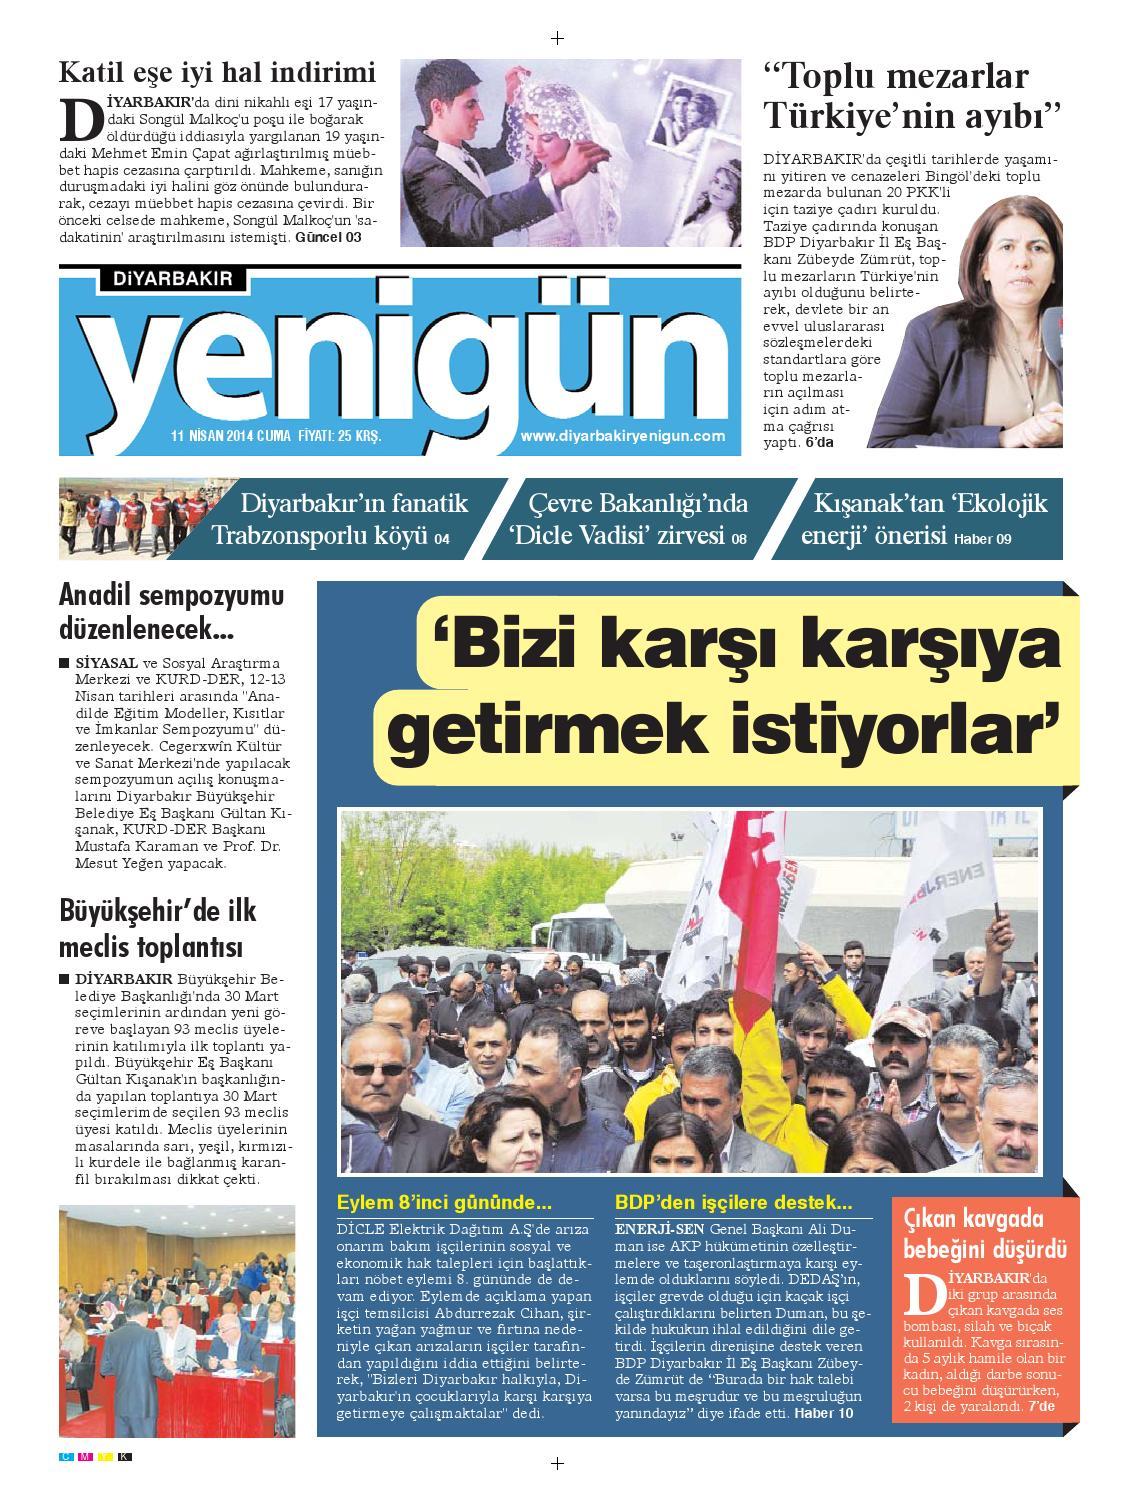 Diyarbakir Yenigun Gazetesi 11 Nisan 2014 By Osman Ergun Issuu